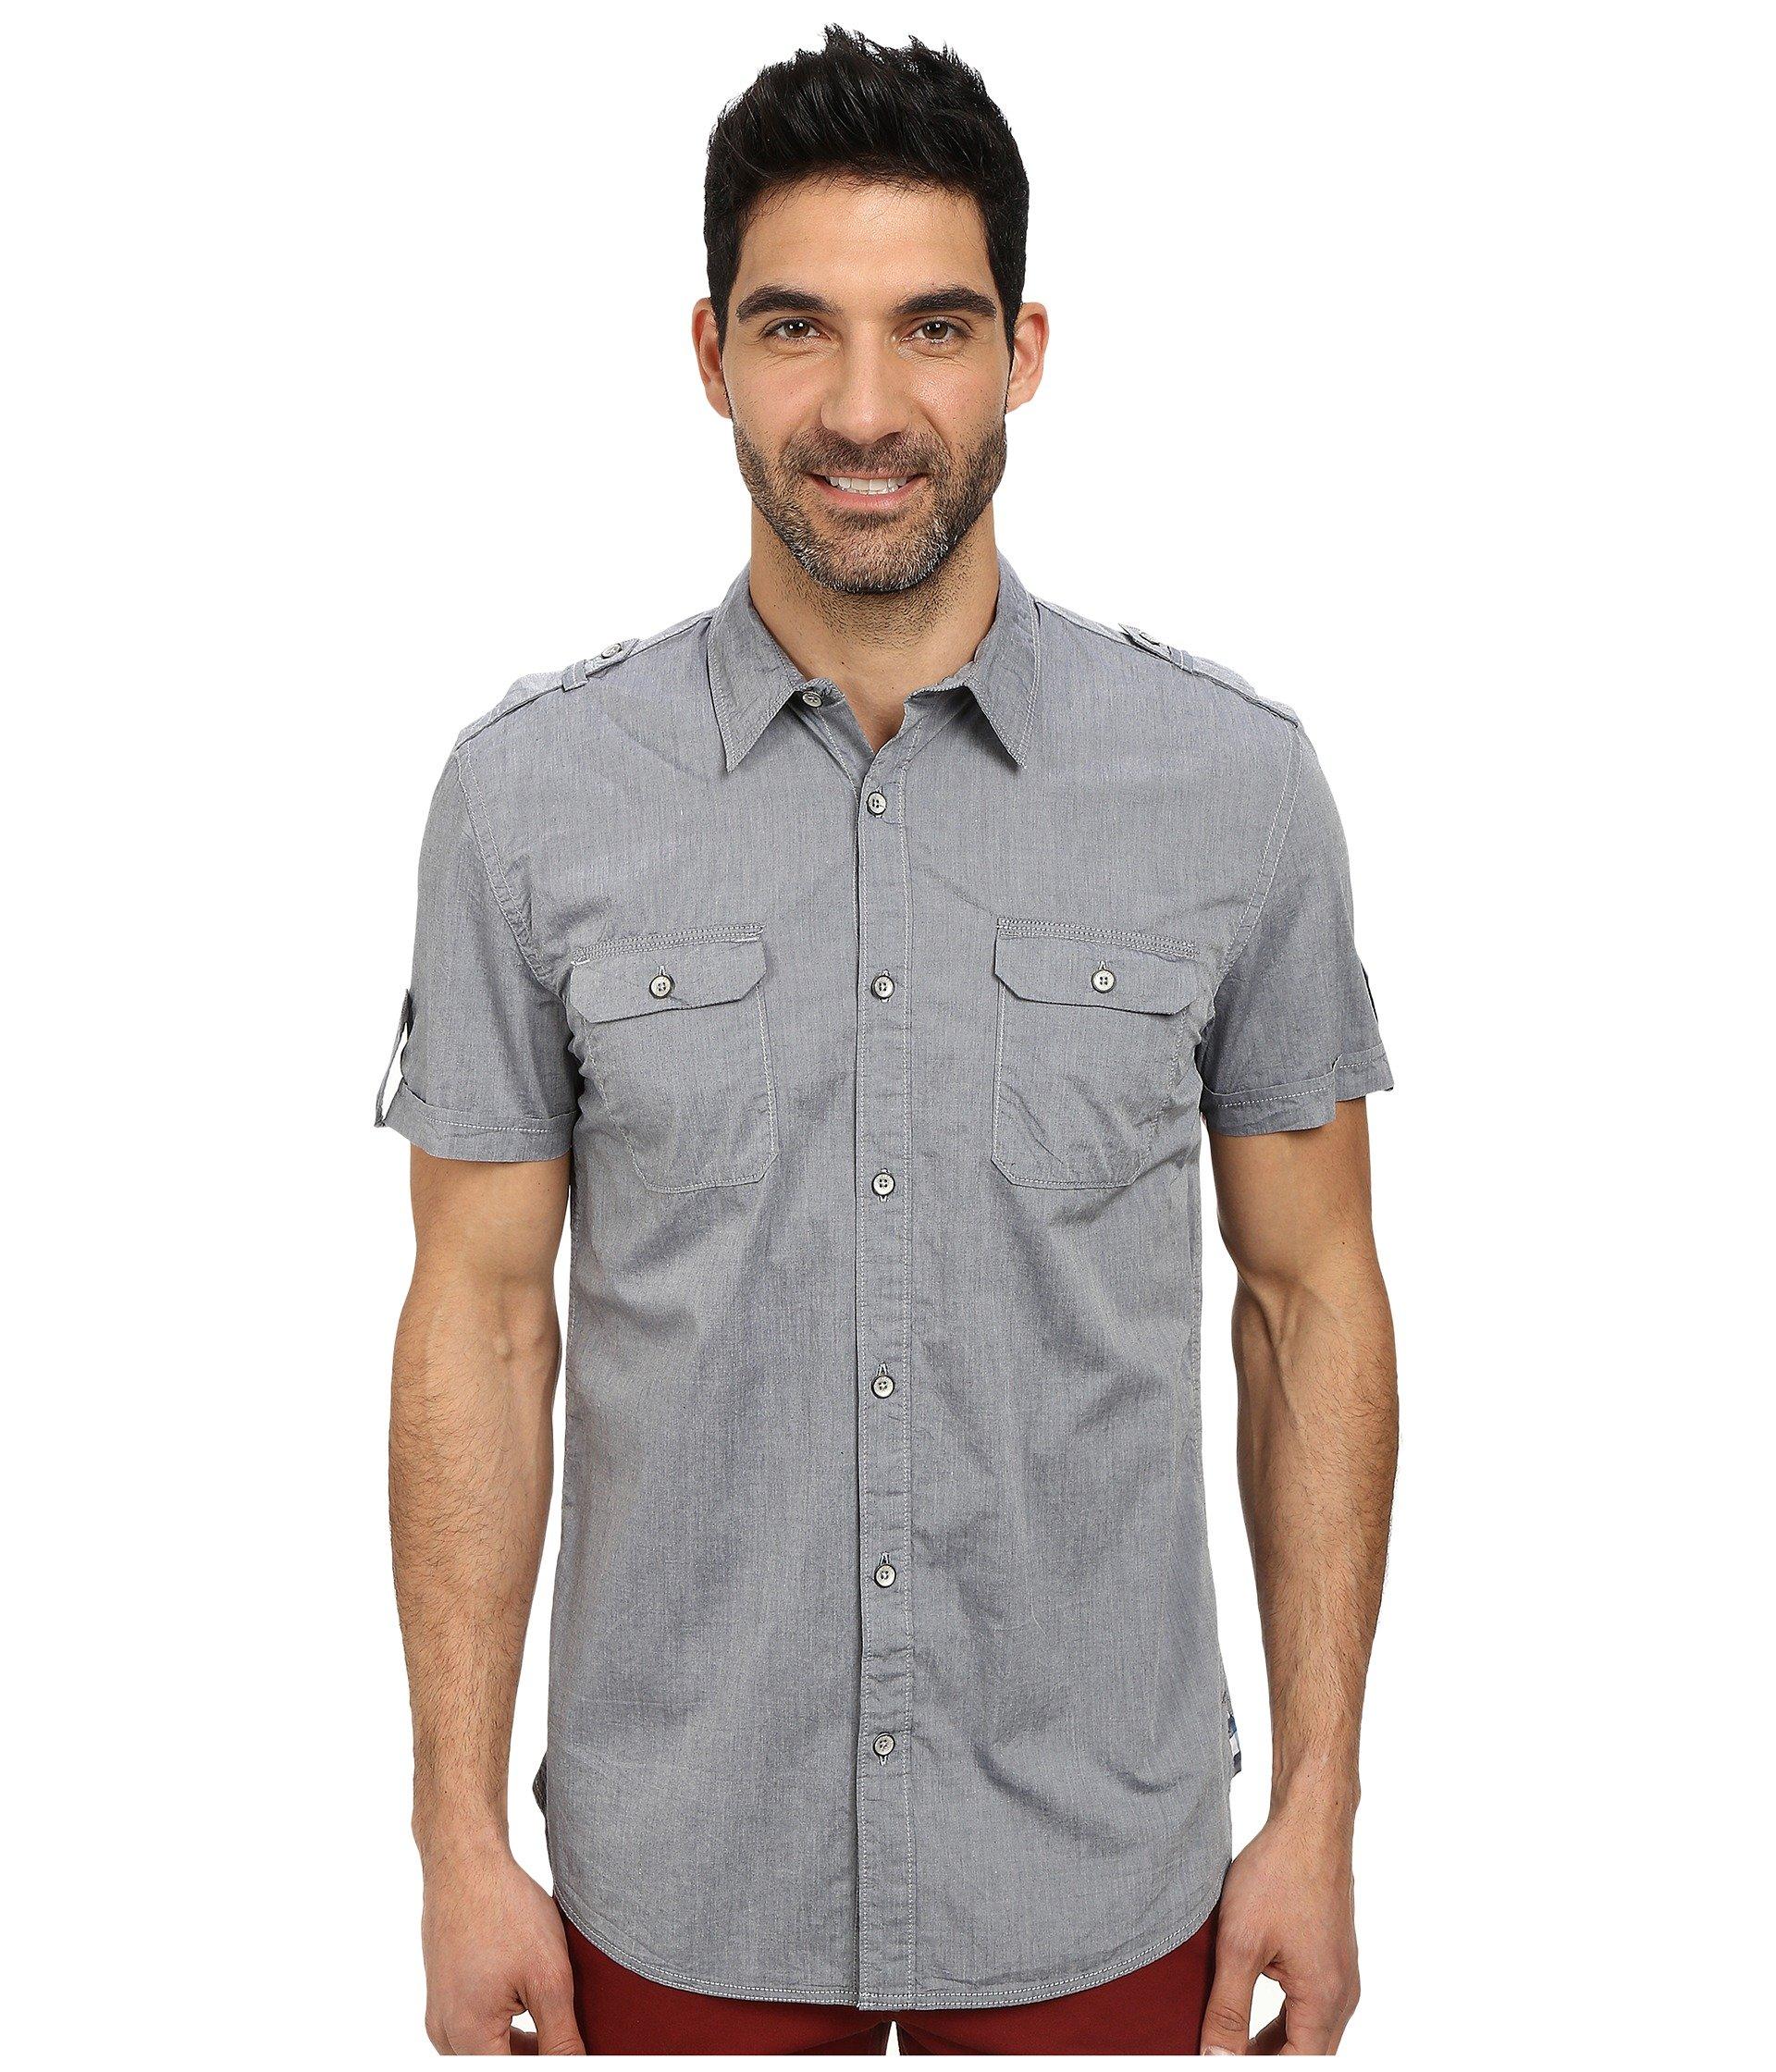 Dkny Short Sleeve Two Pocket Military Chambray Shirt In